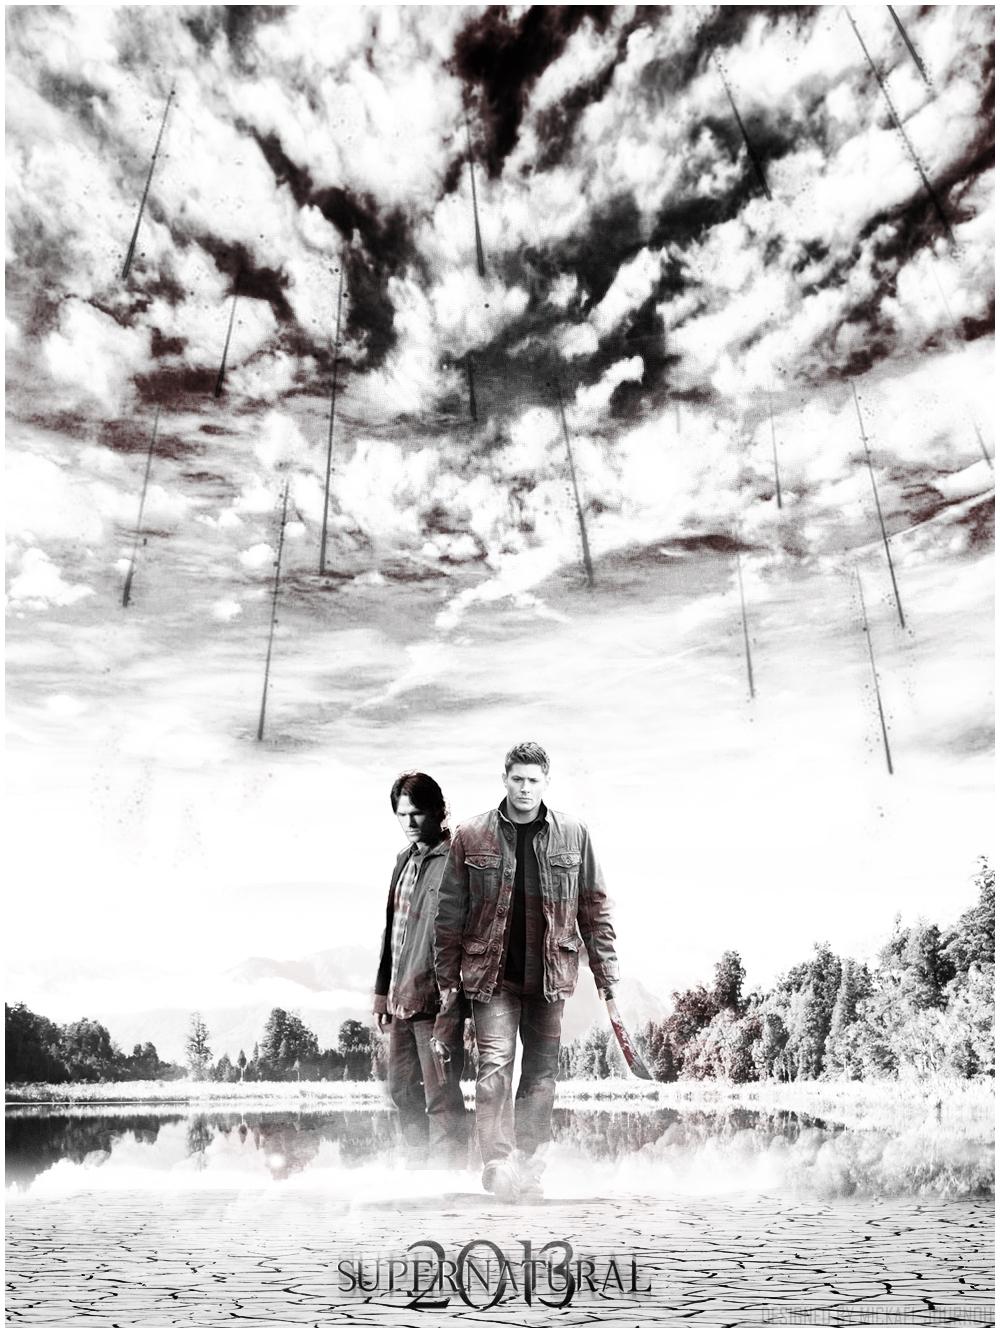 Supernatural Season 9 Poster by FastMike on DeviantArt